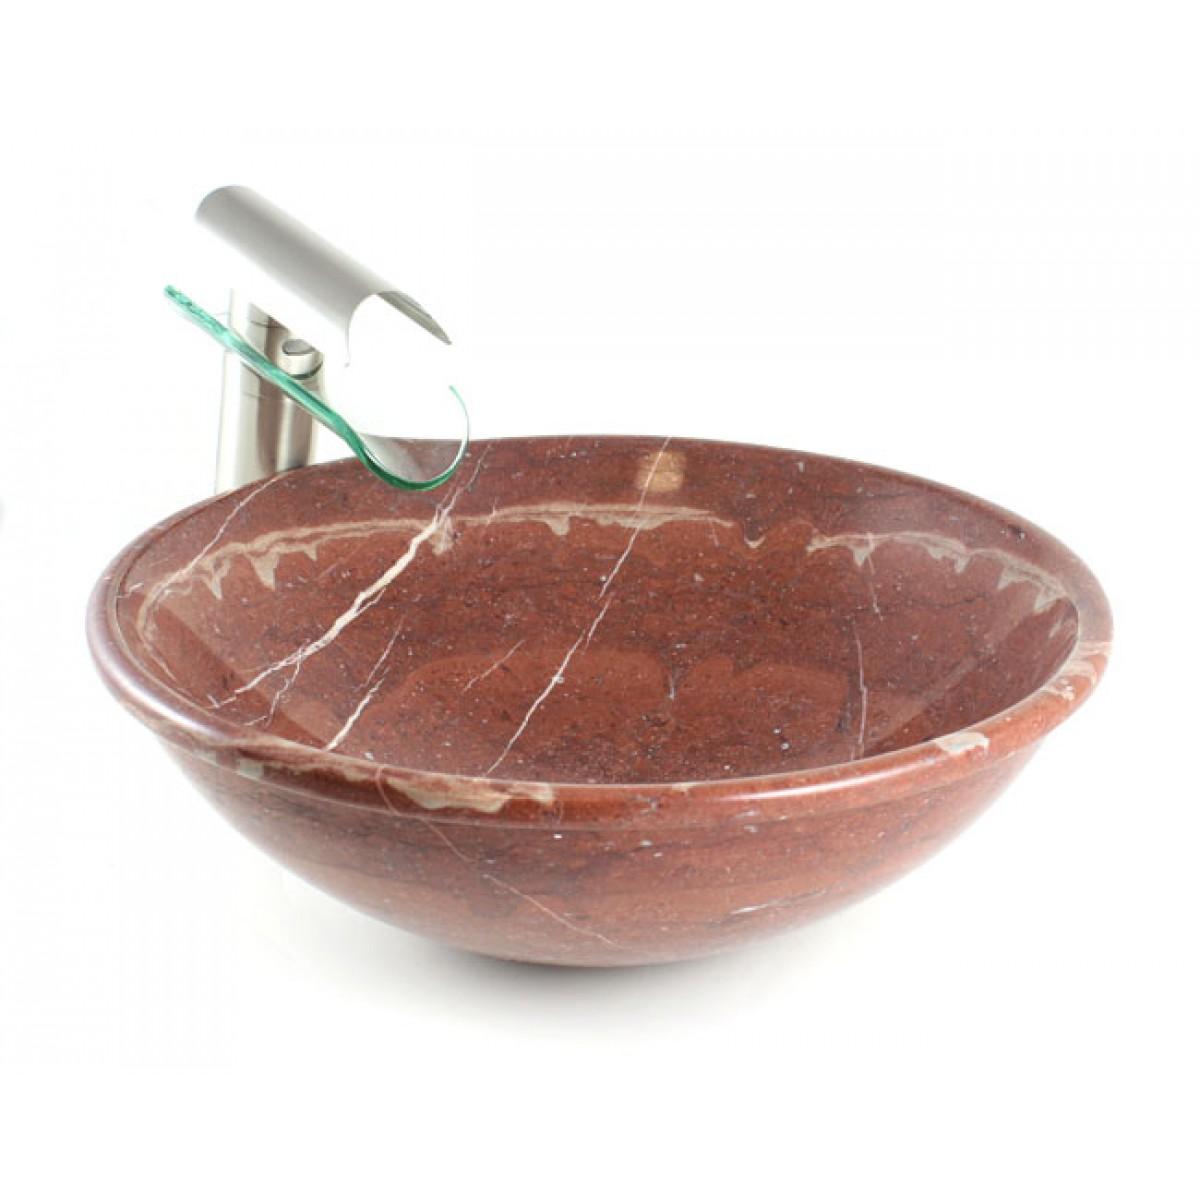 Red Rock Marble Stone Undermount Drop In Countertop Bathroom Lavatory Vessel Sink 16 1 2 X 5 Inch